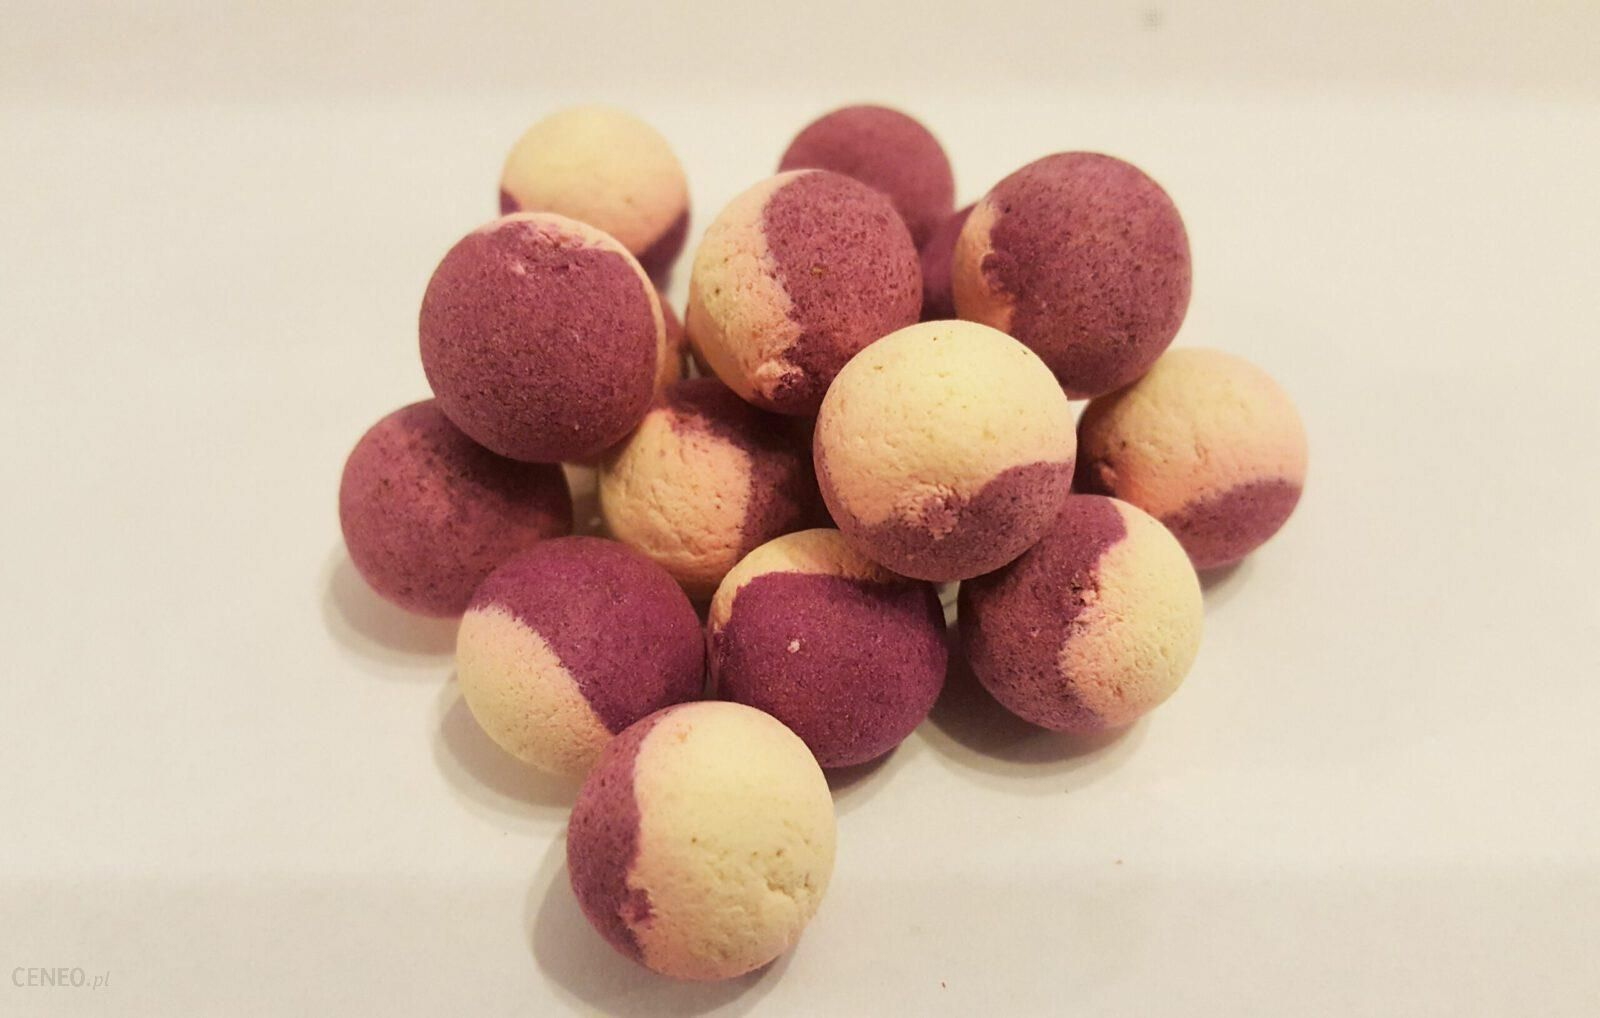 Pollard Baits Pop-Up Garlic & Robin Red 16Mm Czosnek & Robin Red